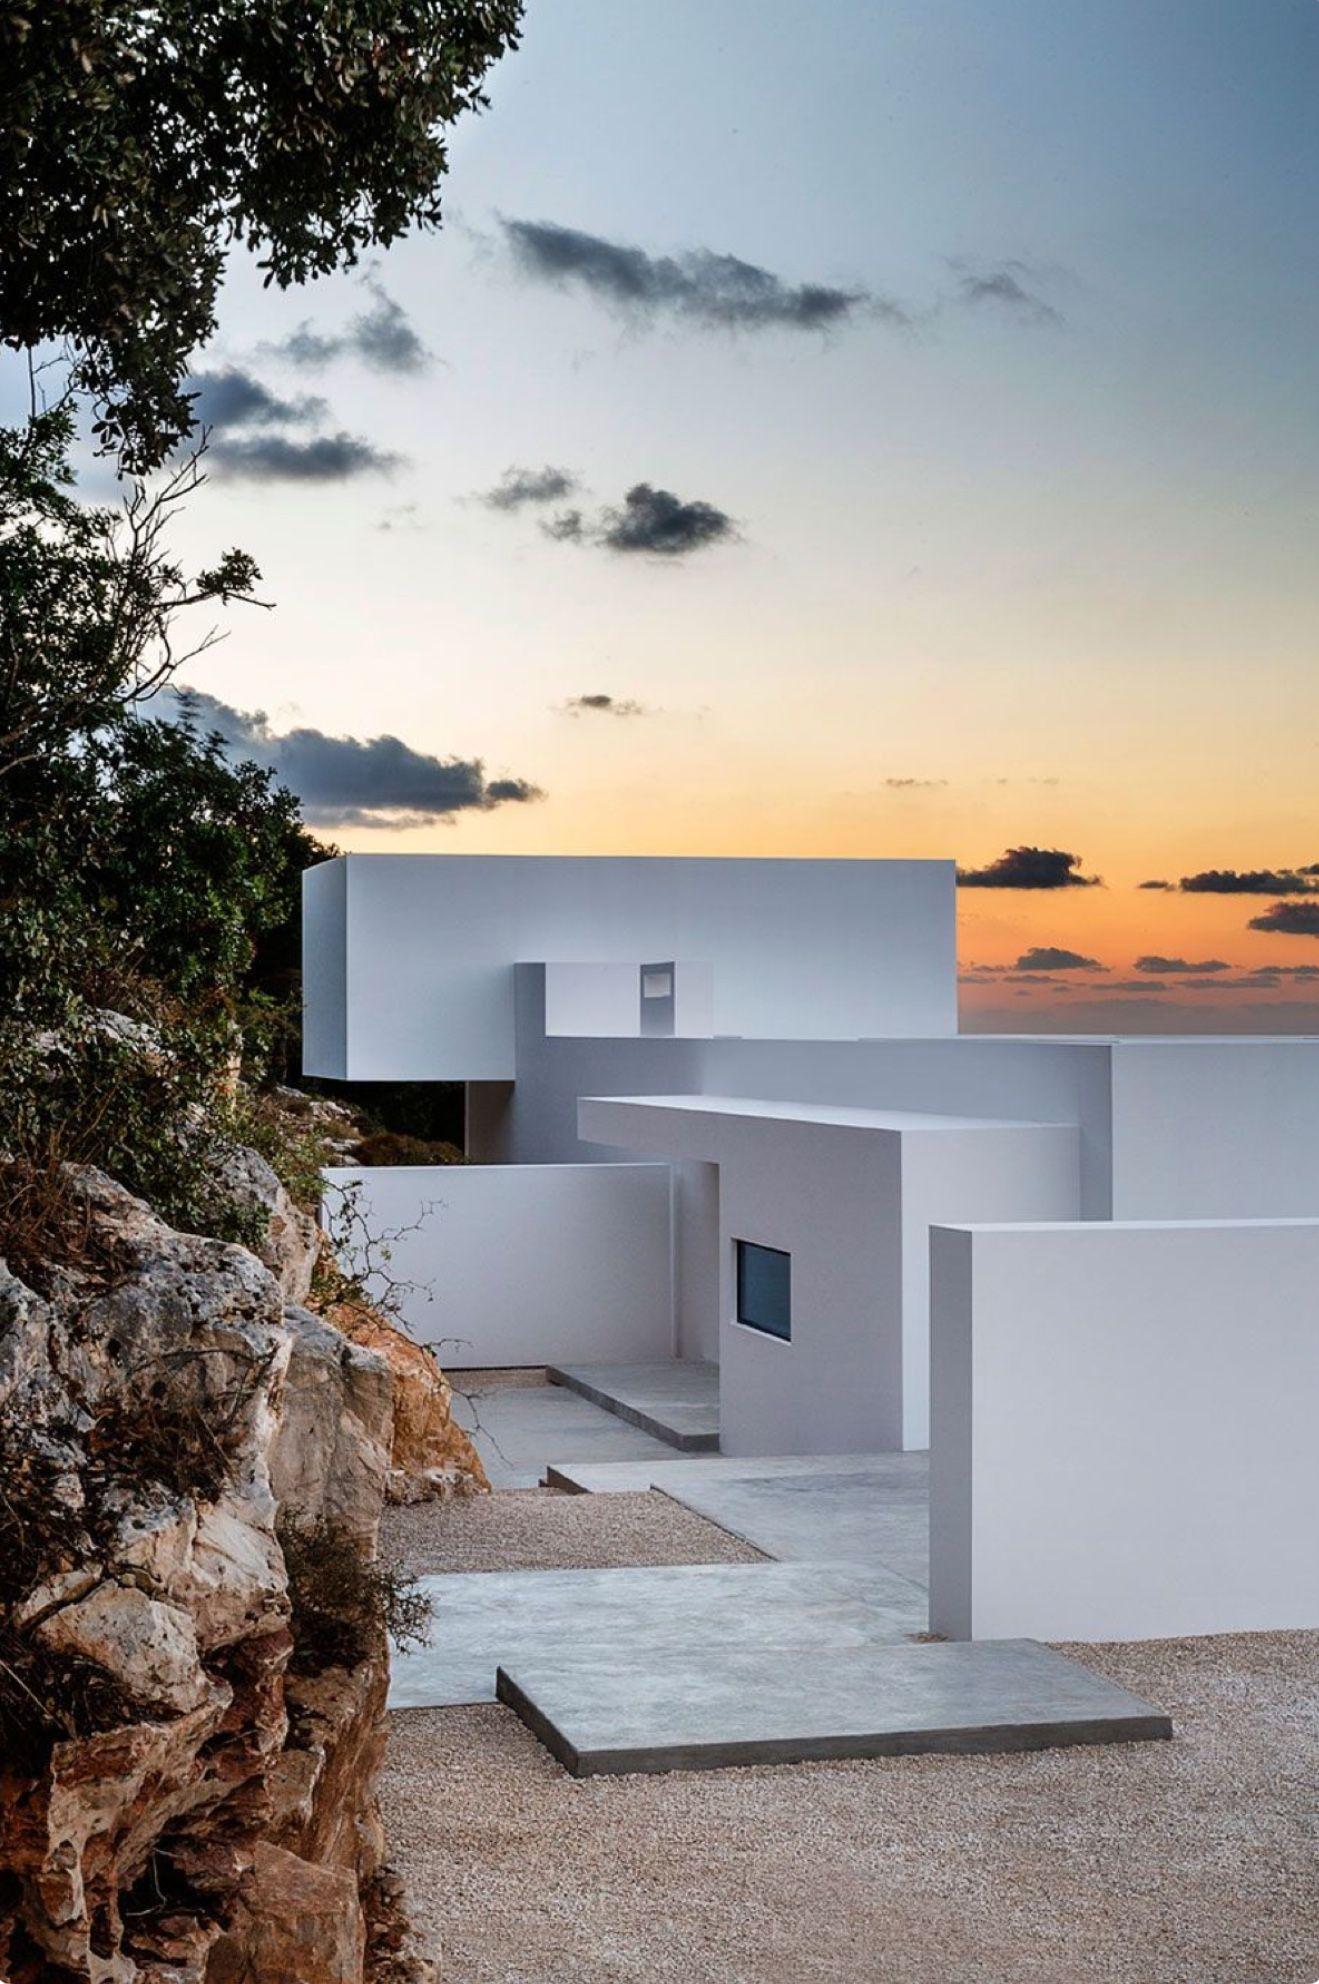 Pin By Carmen Laura On White Mansion Minimalist House Design House Architecture Design Minimalist Architecture